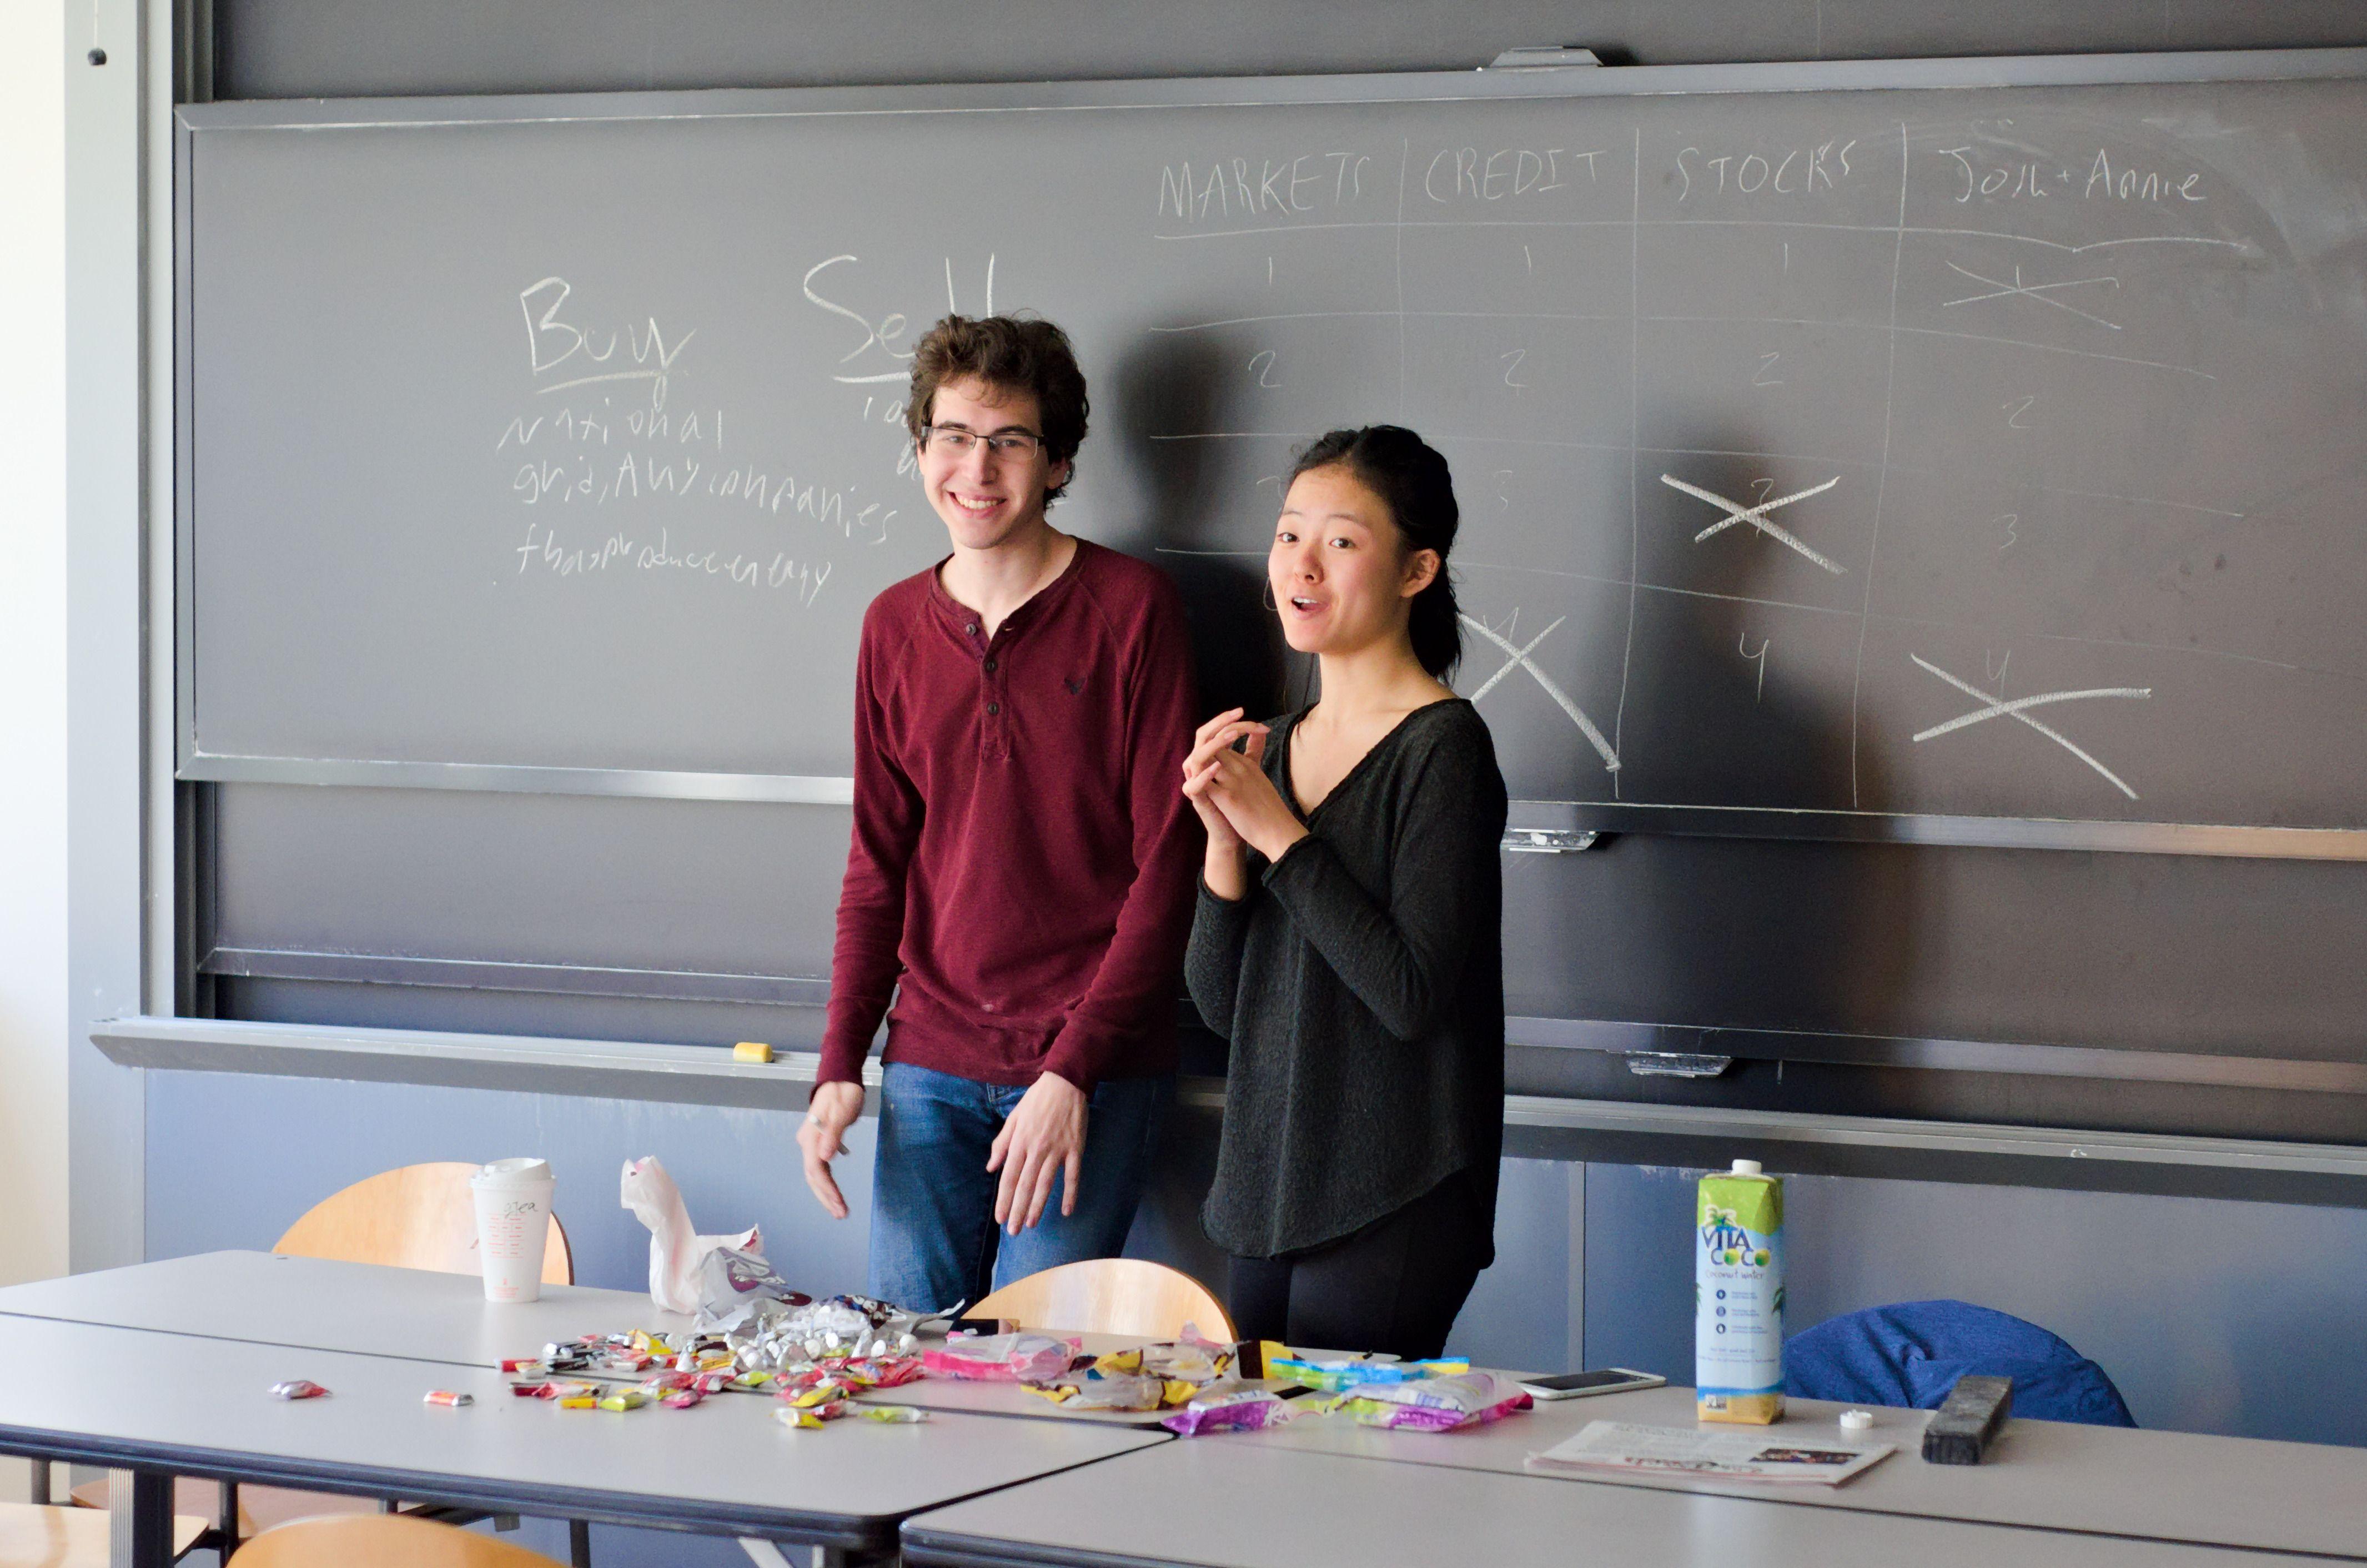 Two teachers standing in front of a chalkboard